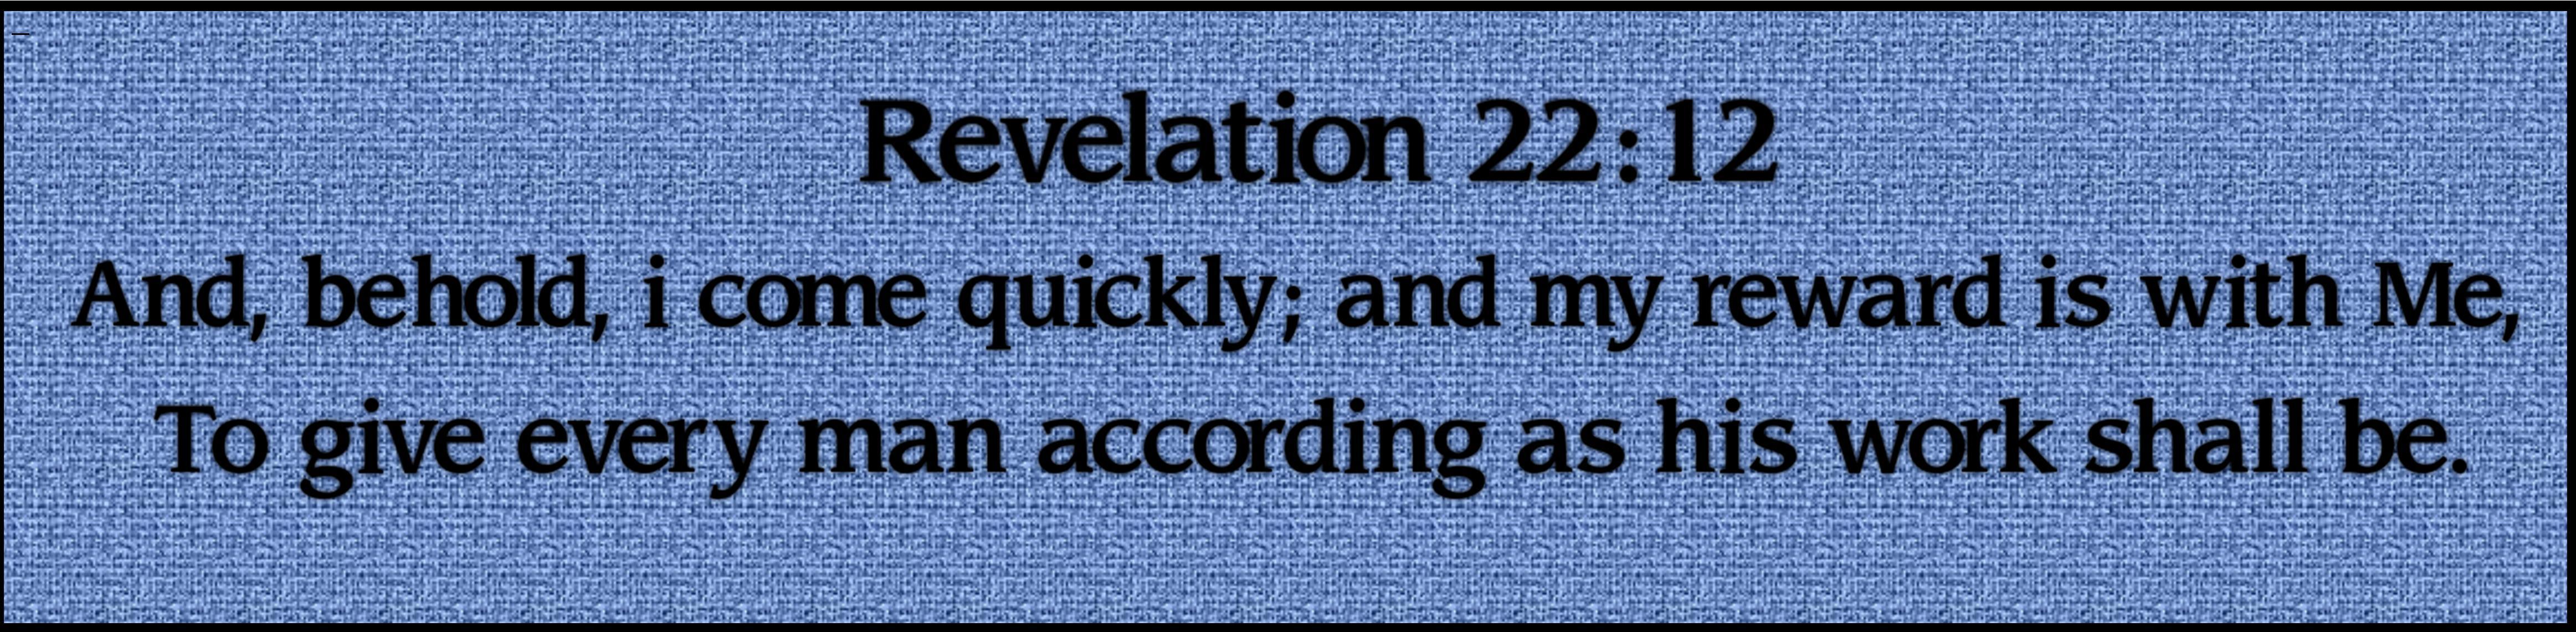 revelation 2212